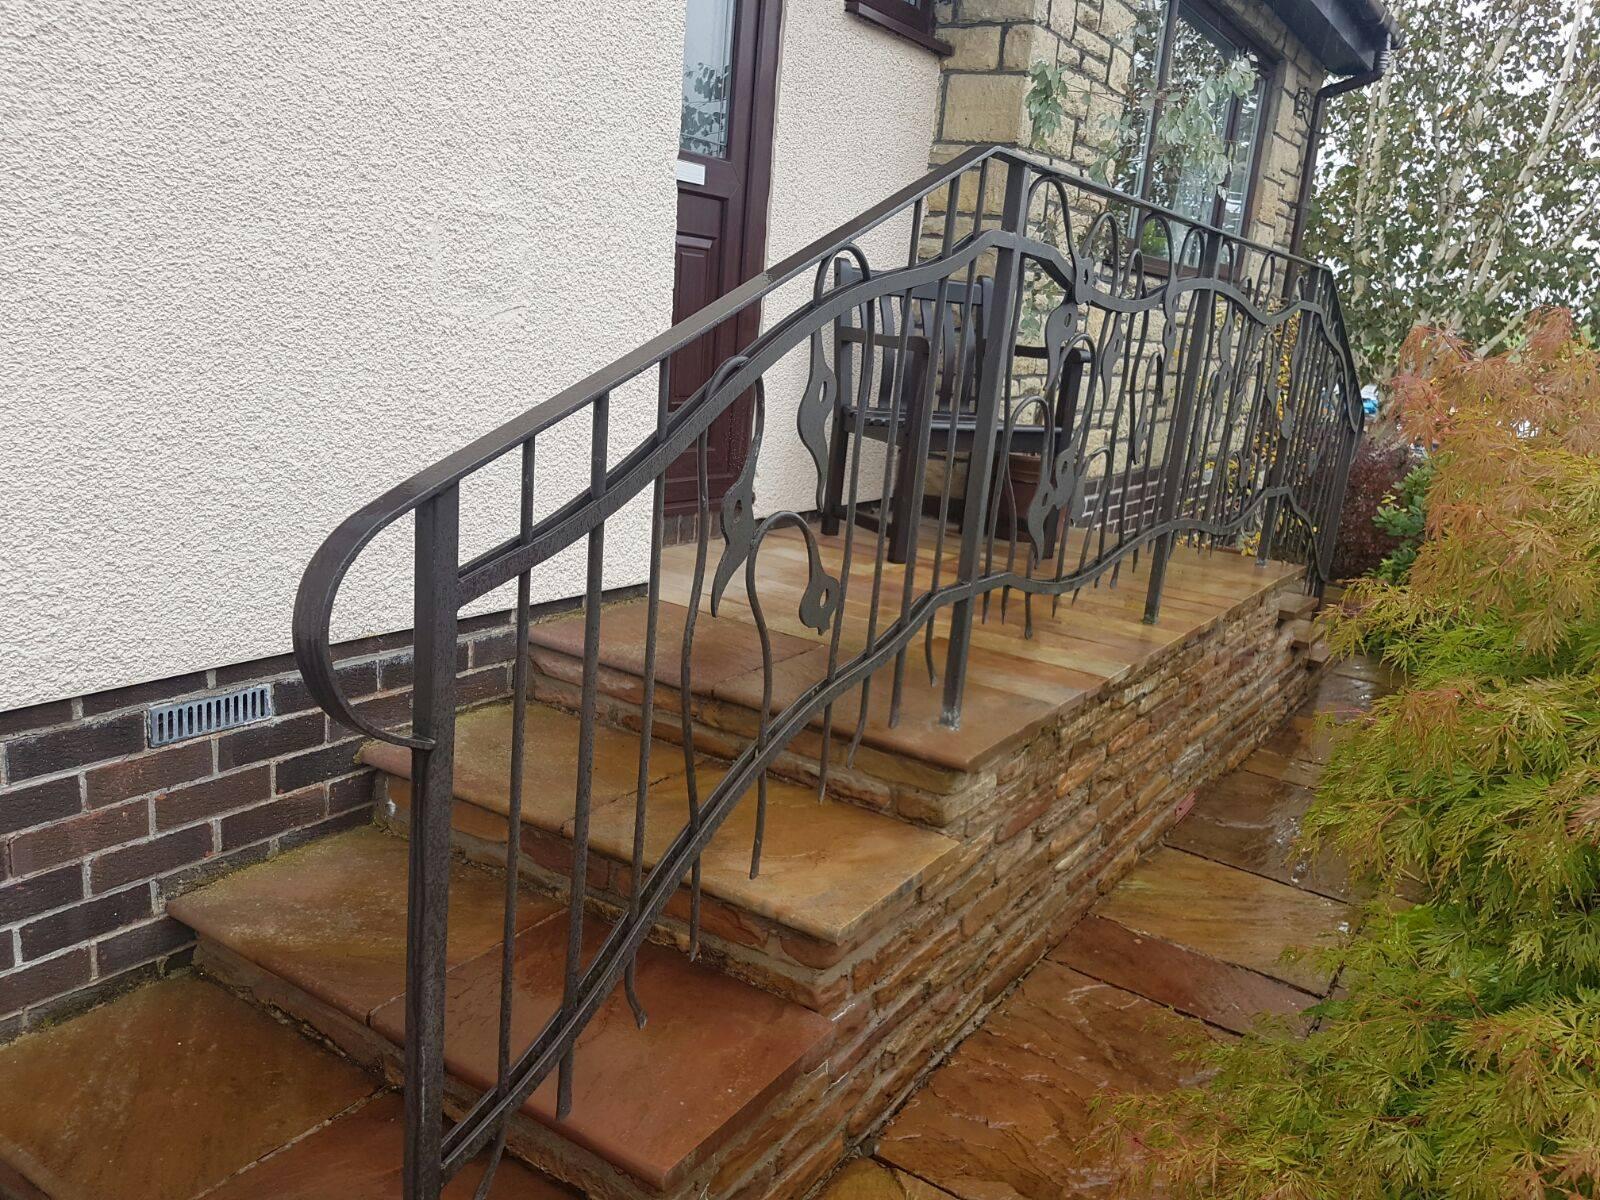 Custom decorative handrail by Dain Art Iron in Ayrshire, Scotland